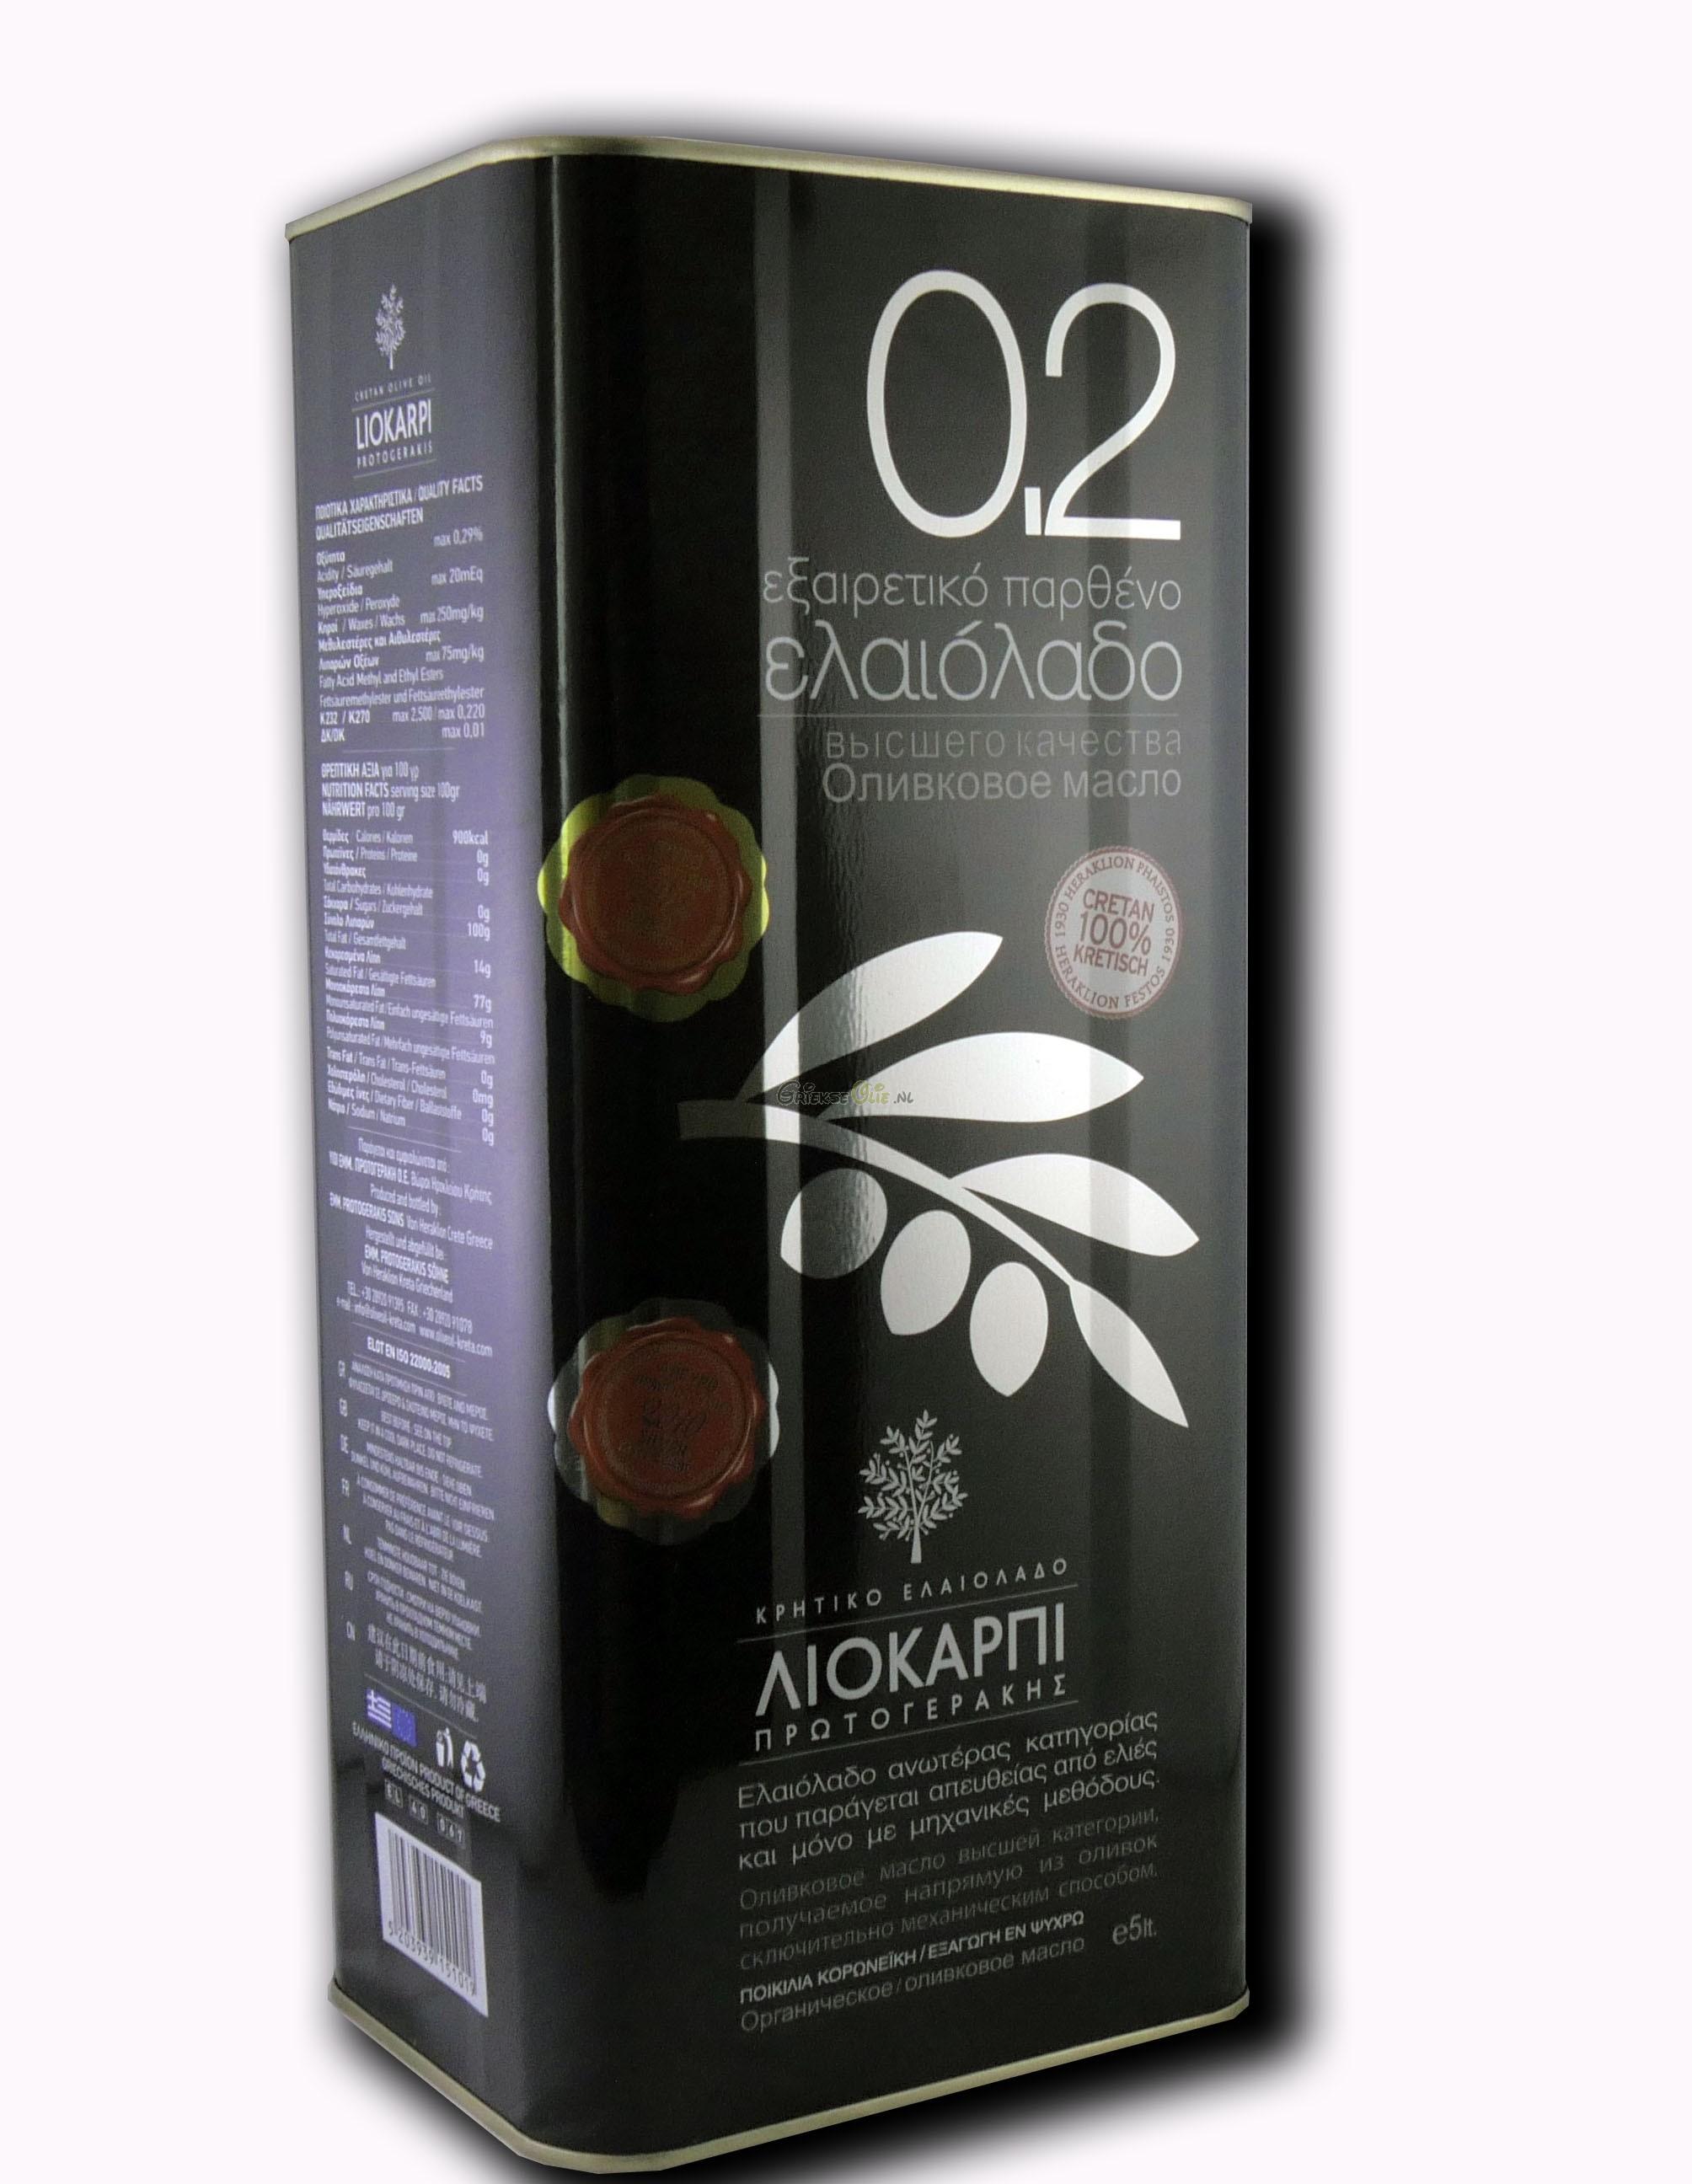 0.2 Extra Vergine Olijfolie uit Kreta met extra lage zuurgraad - 5 liter blik